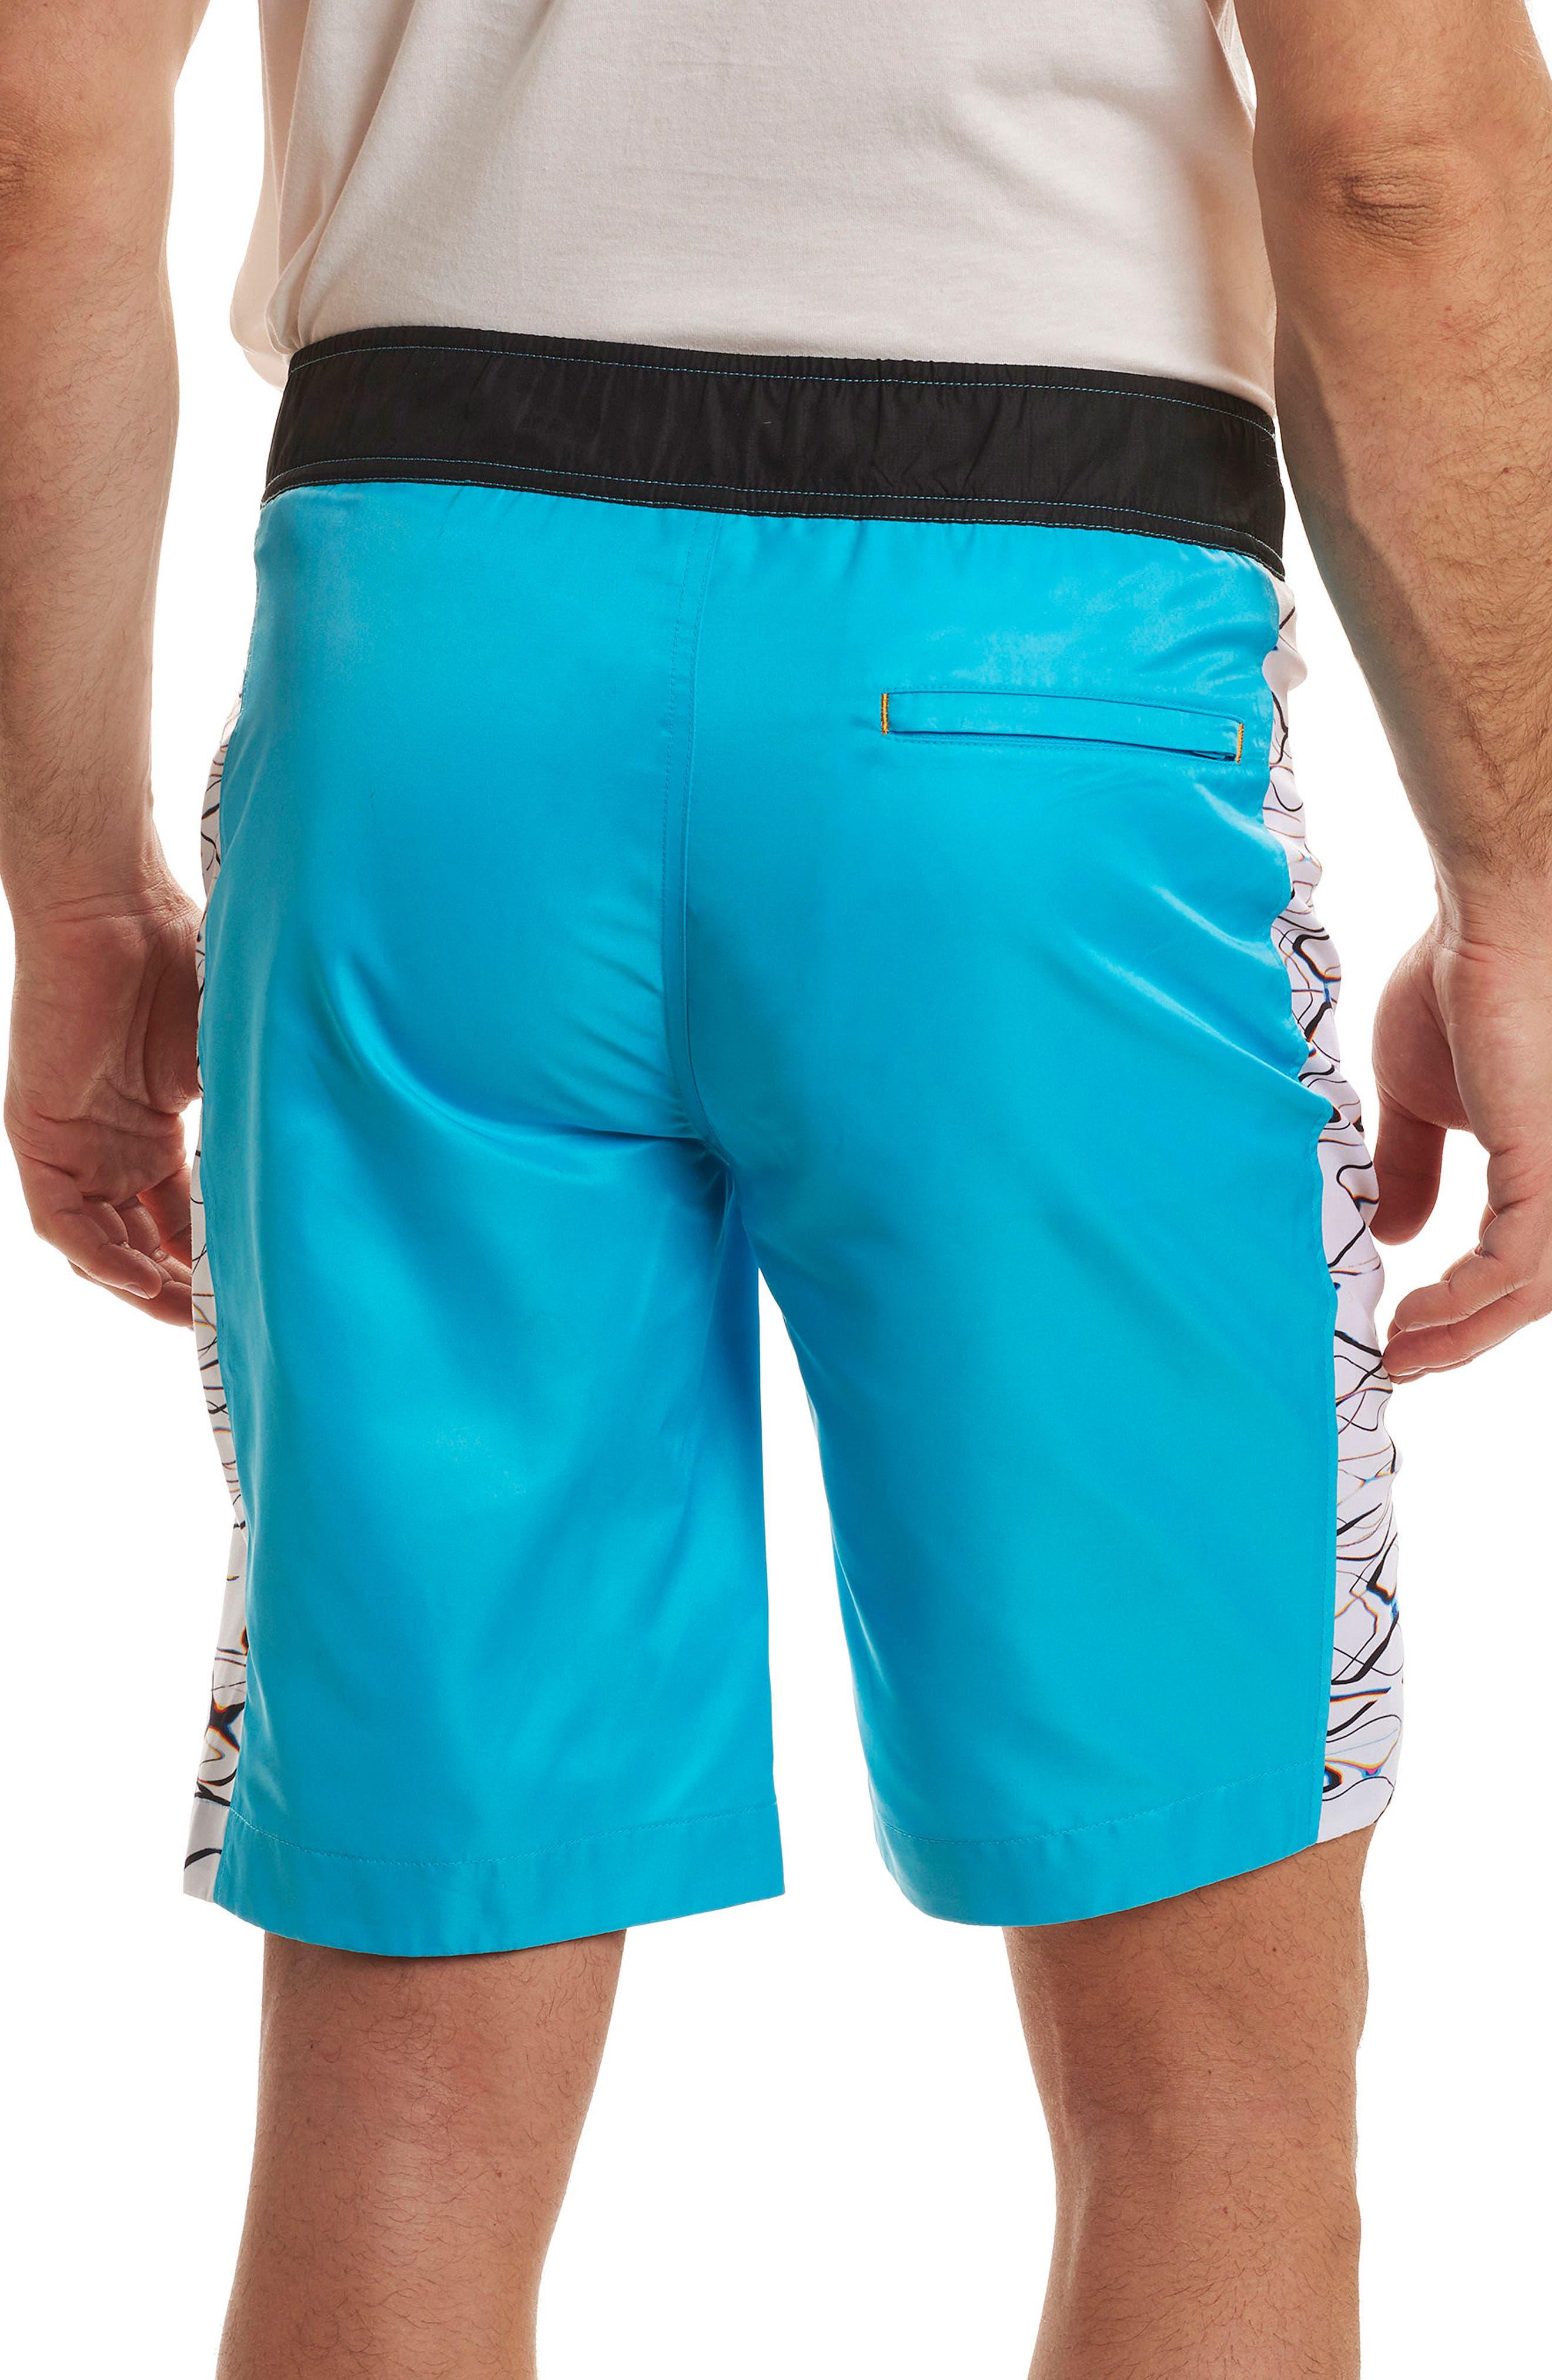 Maili Classic Fit Swim Trunks,                             Alternate thumbnail 2, color,                             459